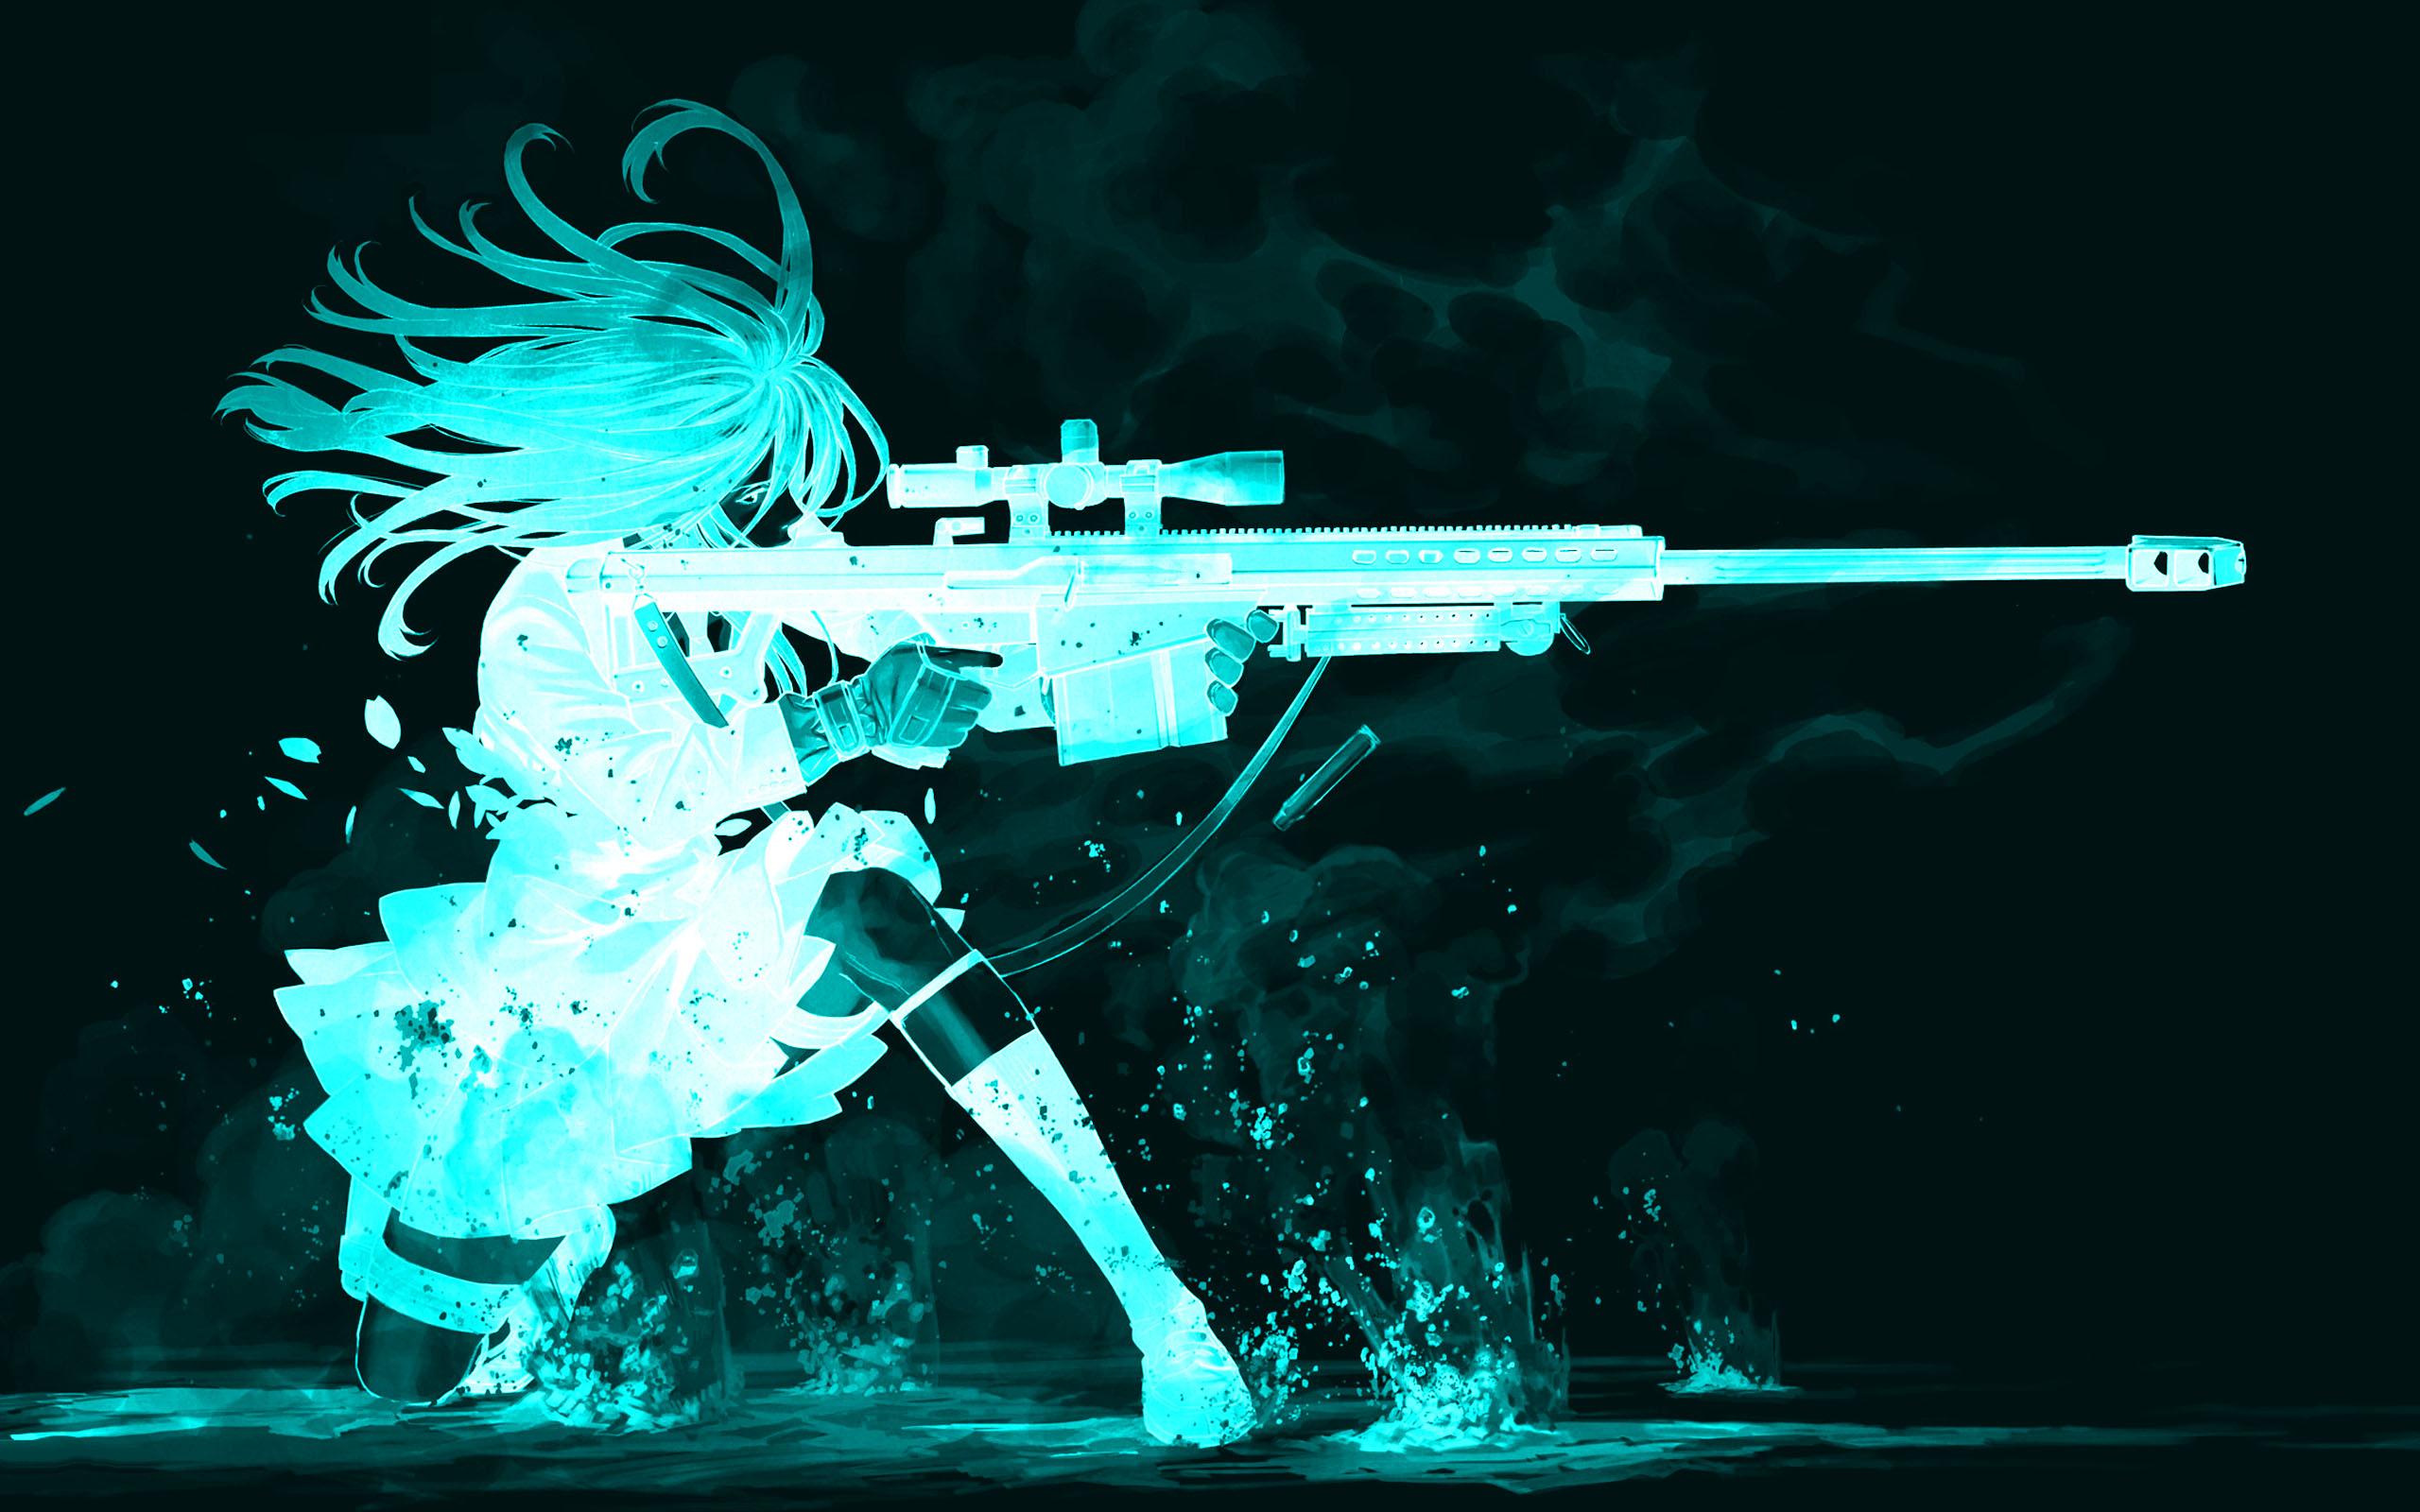 gun girl computer wallpapers - photo #20